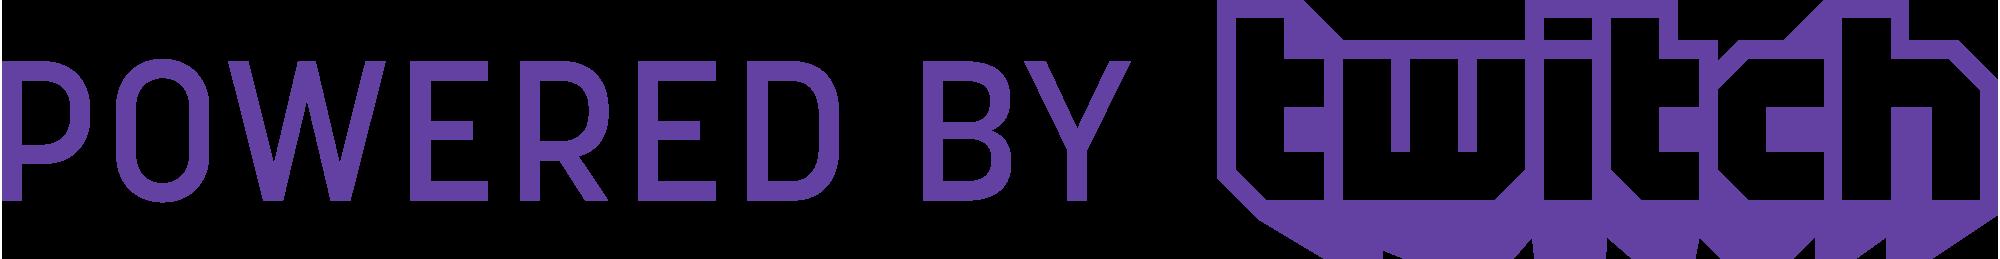 PoweredbyTwitch_Purple_Horizontal.png